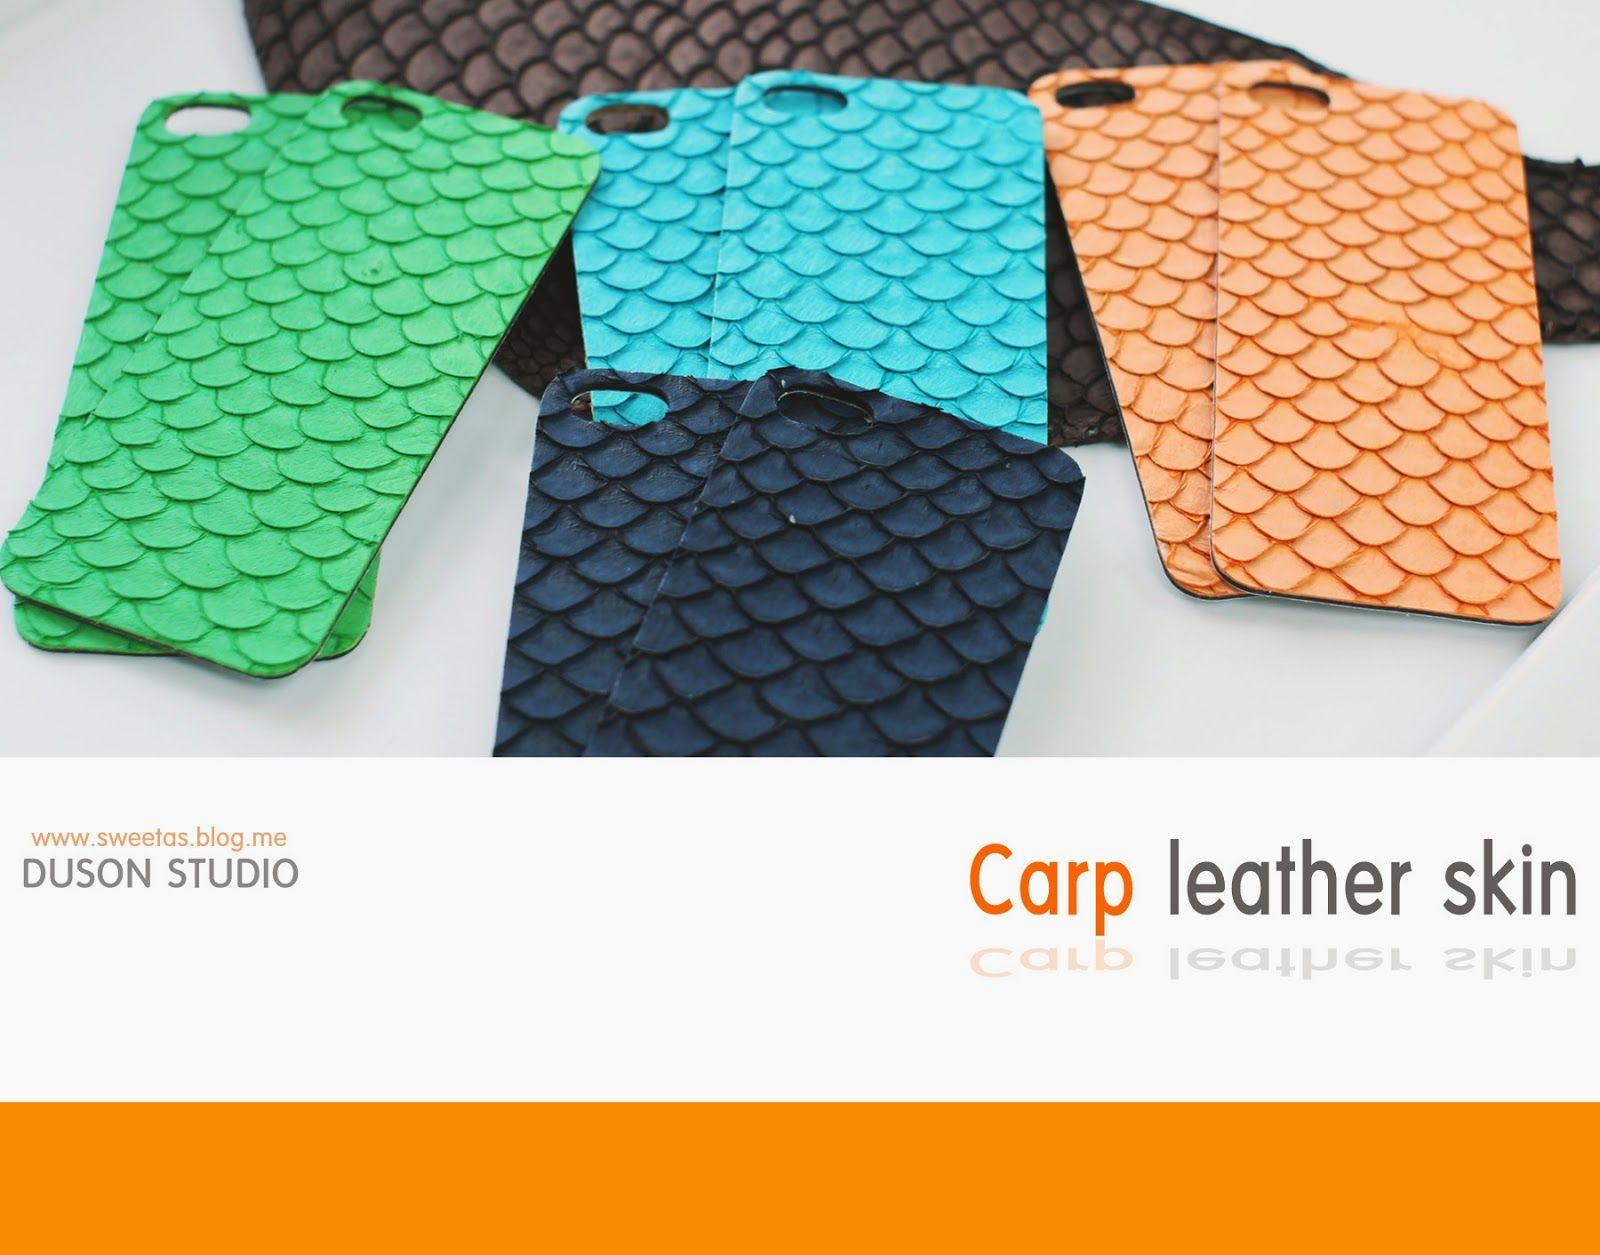 handmade factory DUSON: I phone 5/5s carp leather skin cover